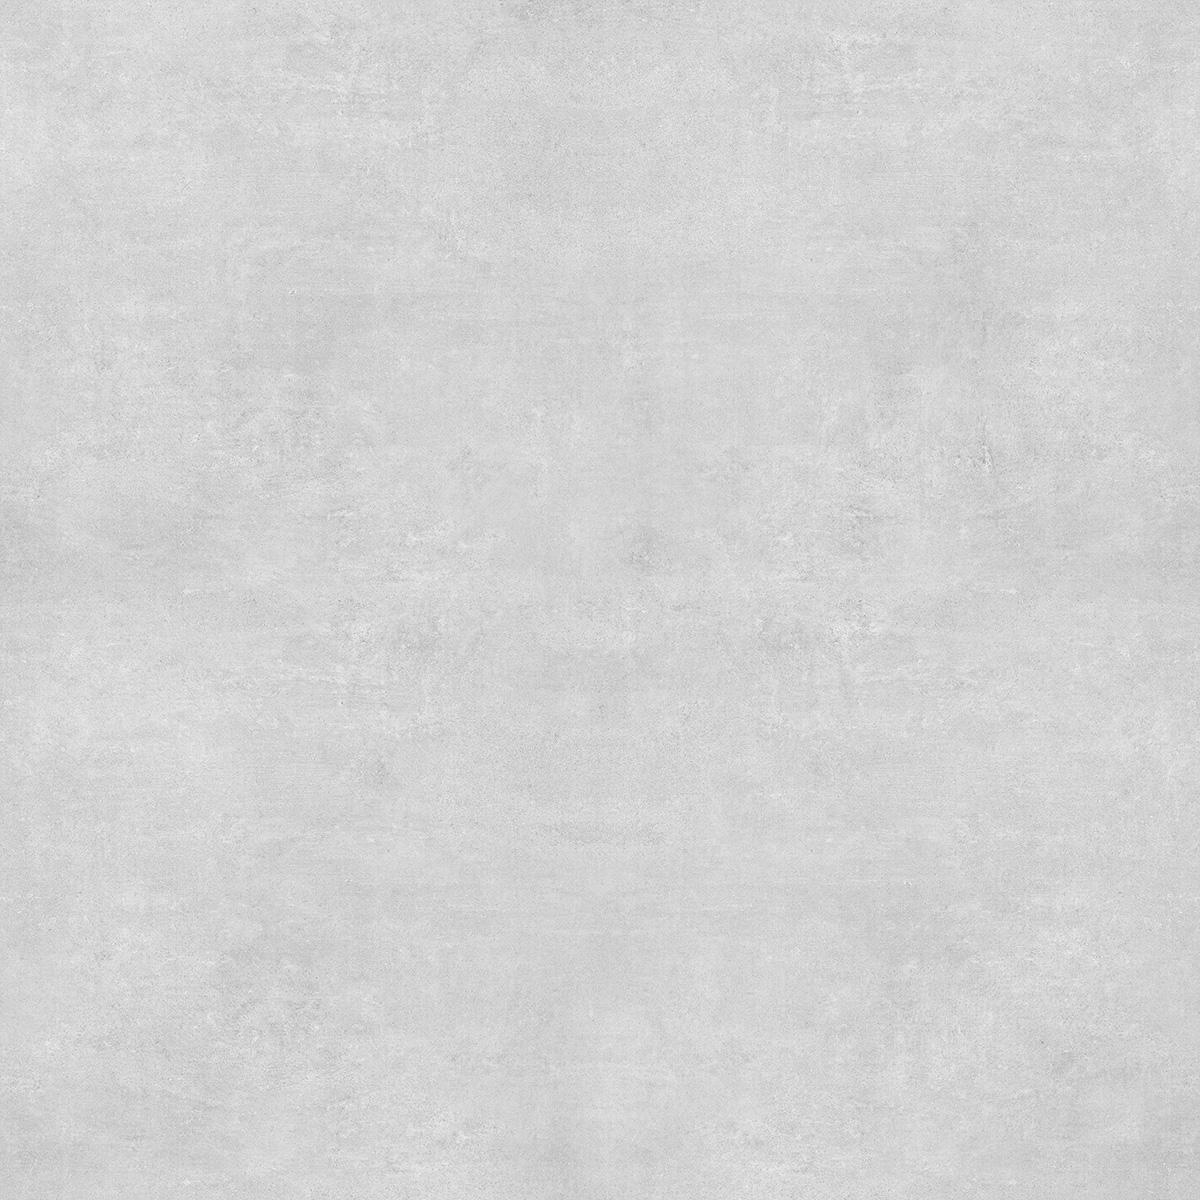 MIRA grey Image